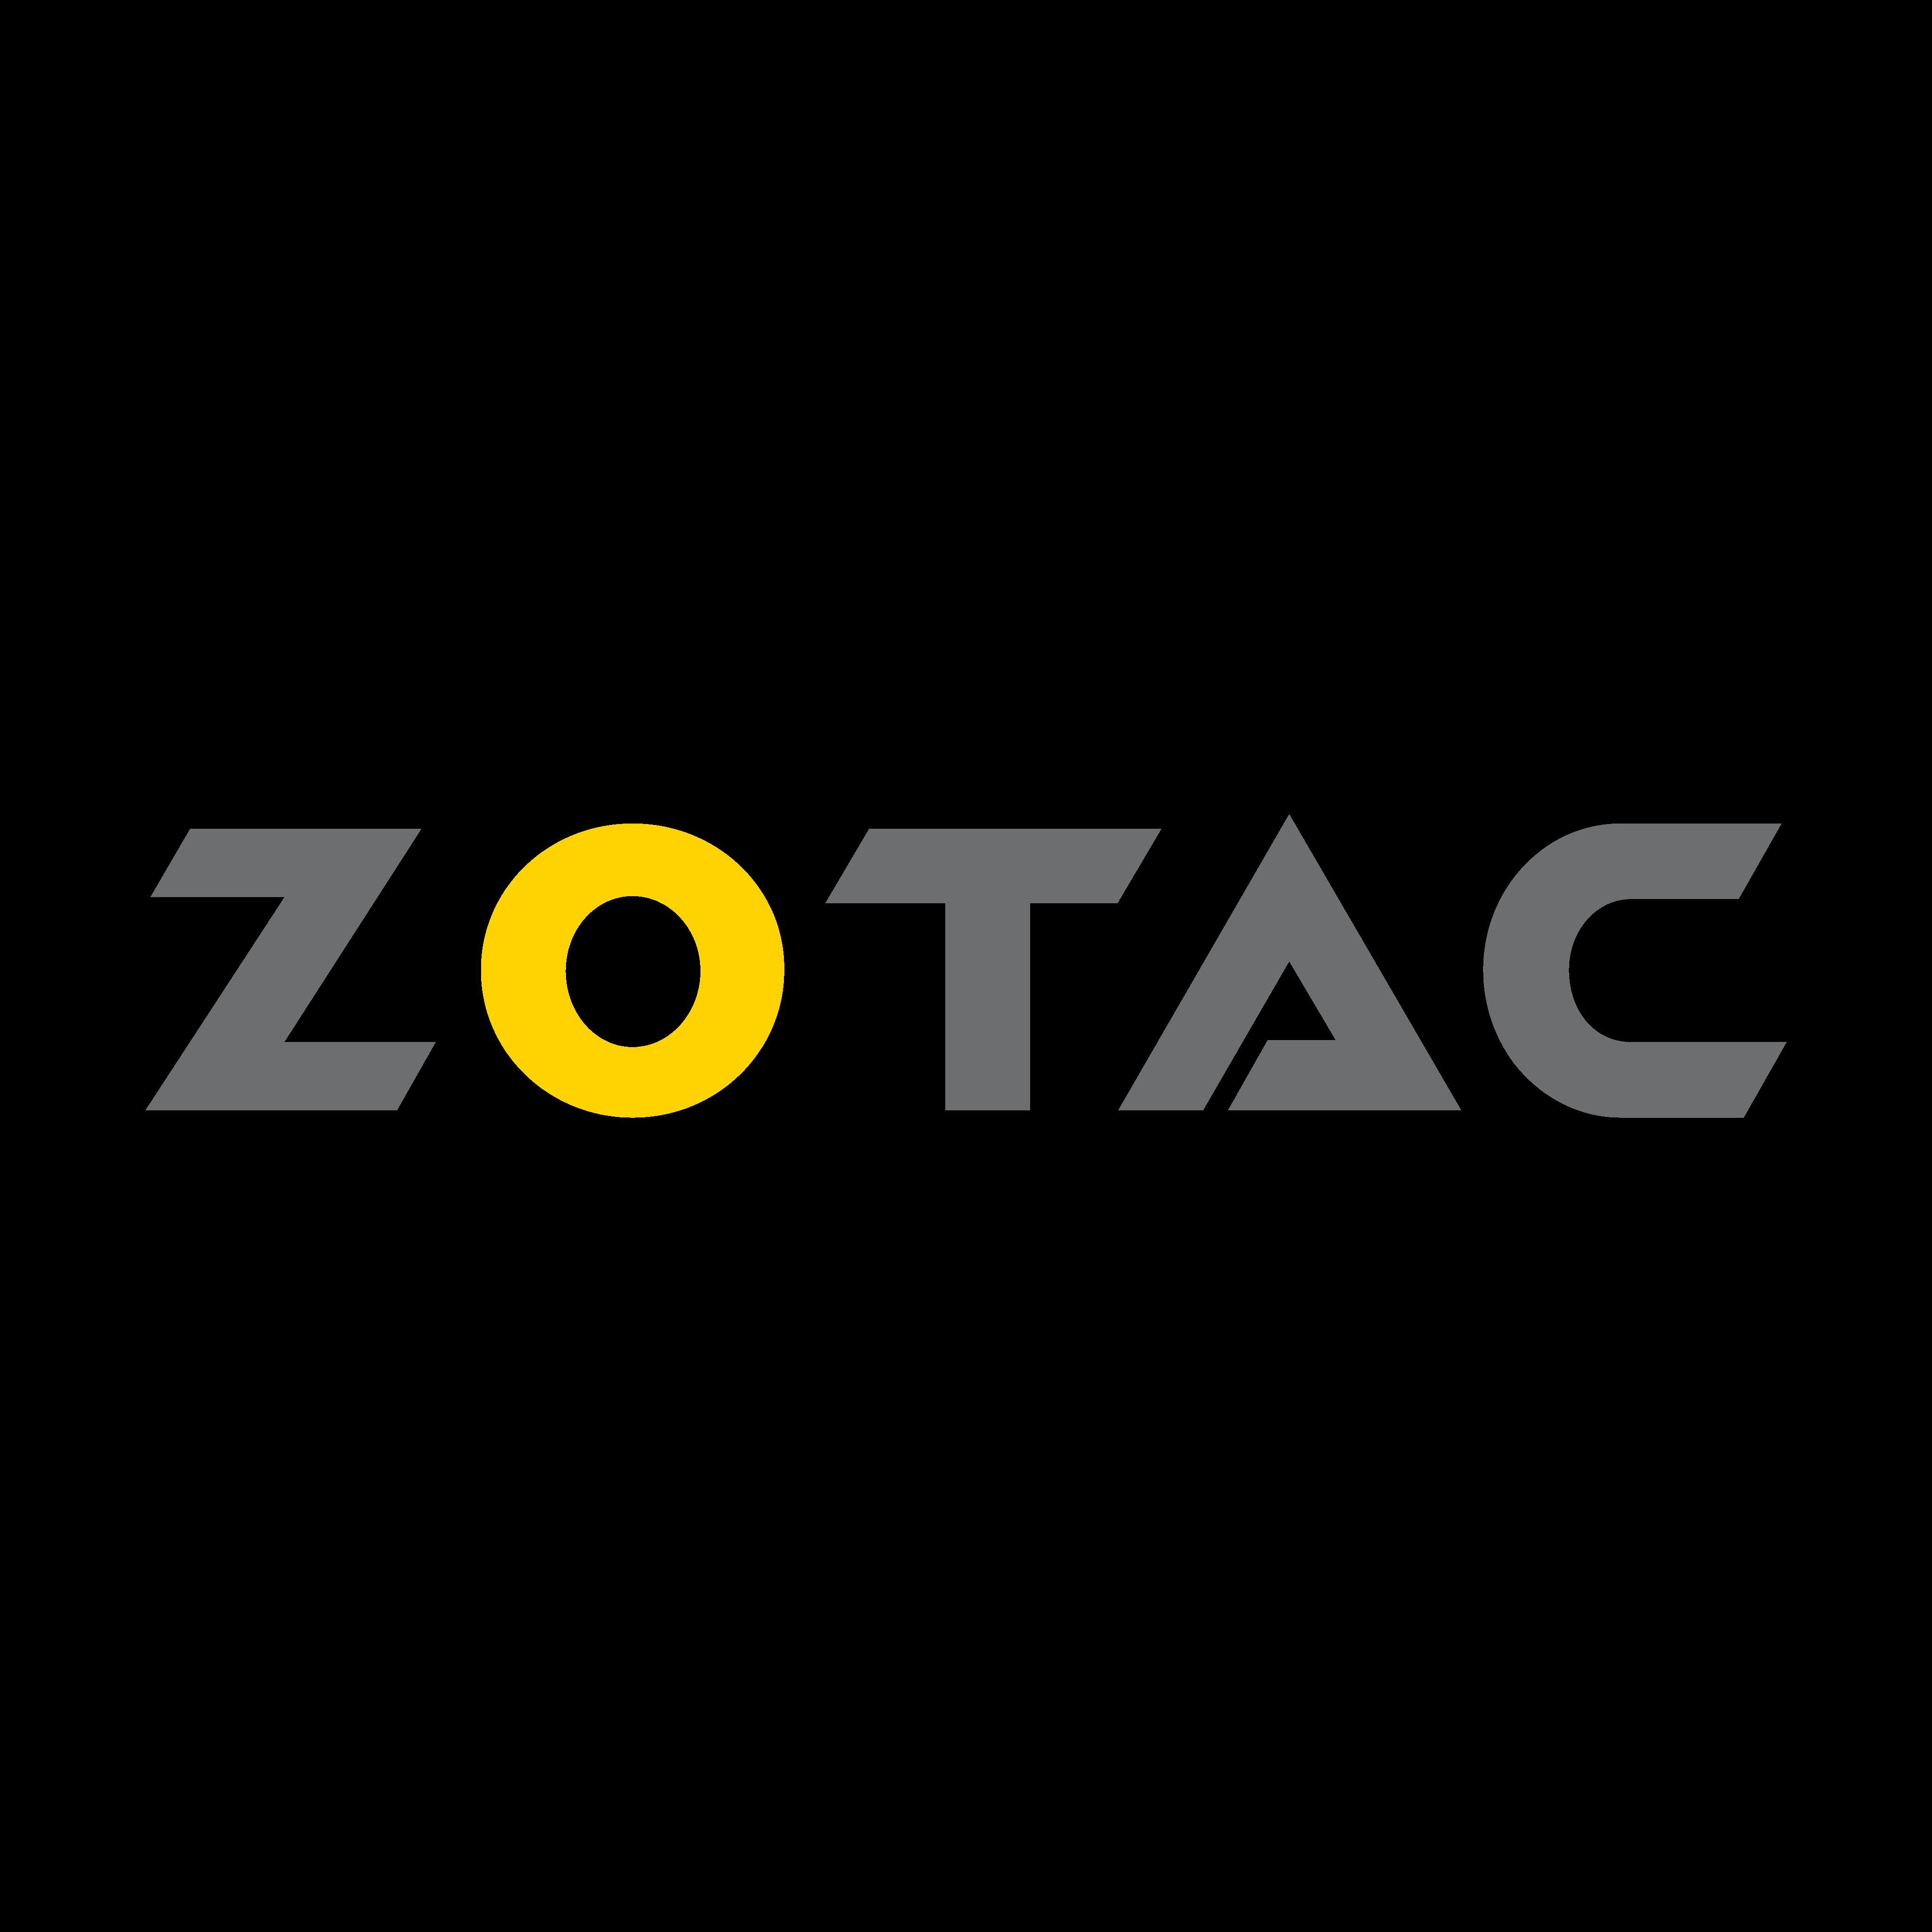 zotac logo 0 - Zotac Logo